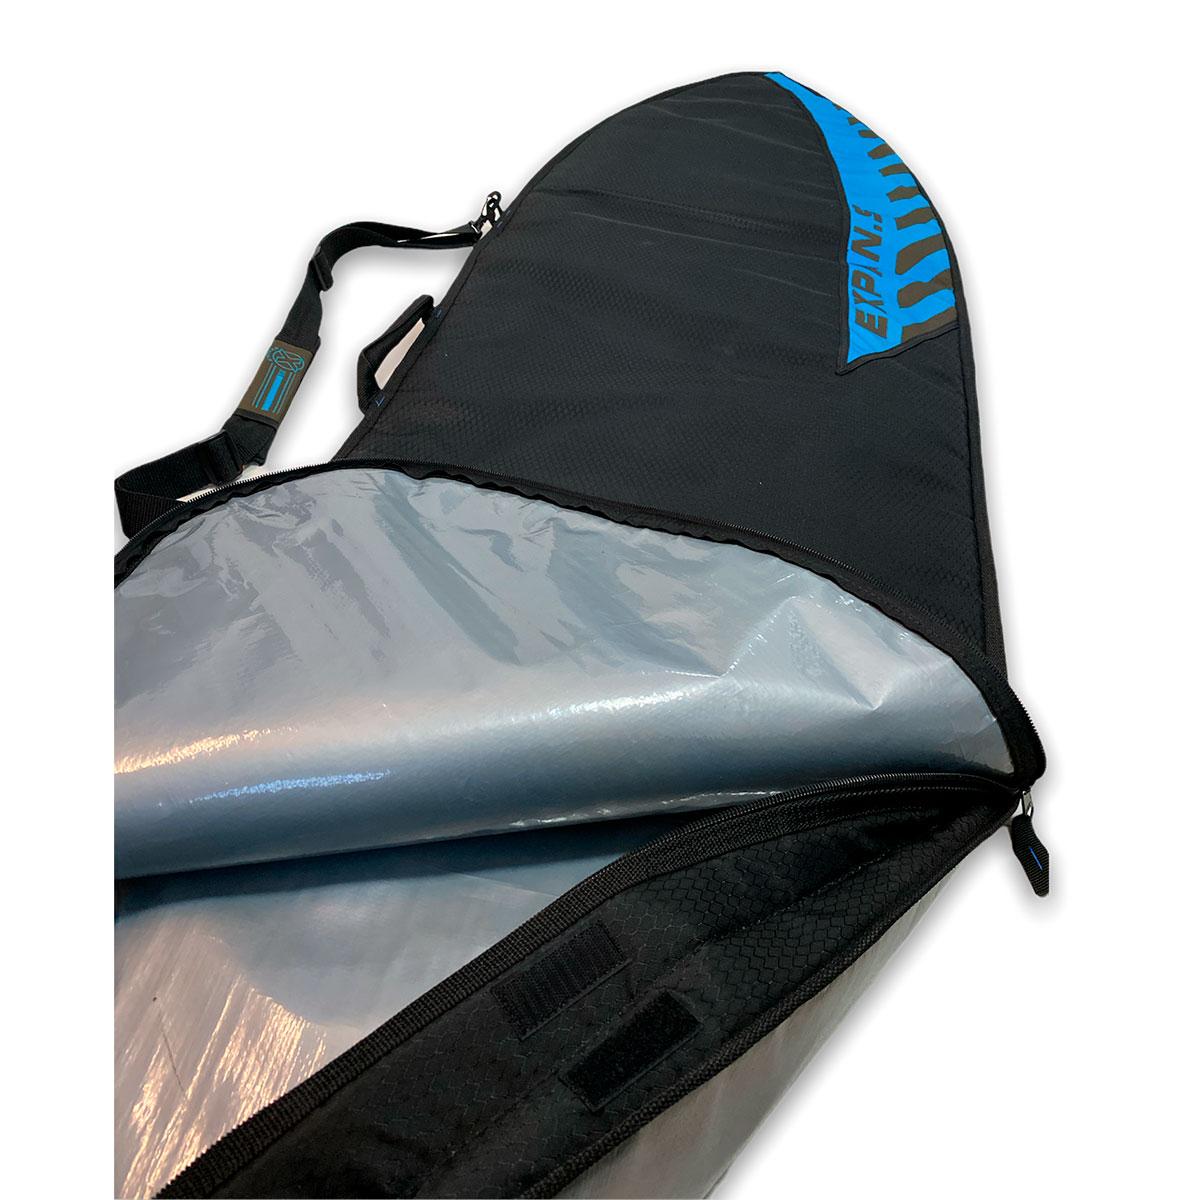 Capa tecido importado acolchoada - SELECT LINE